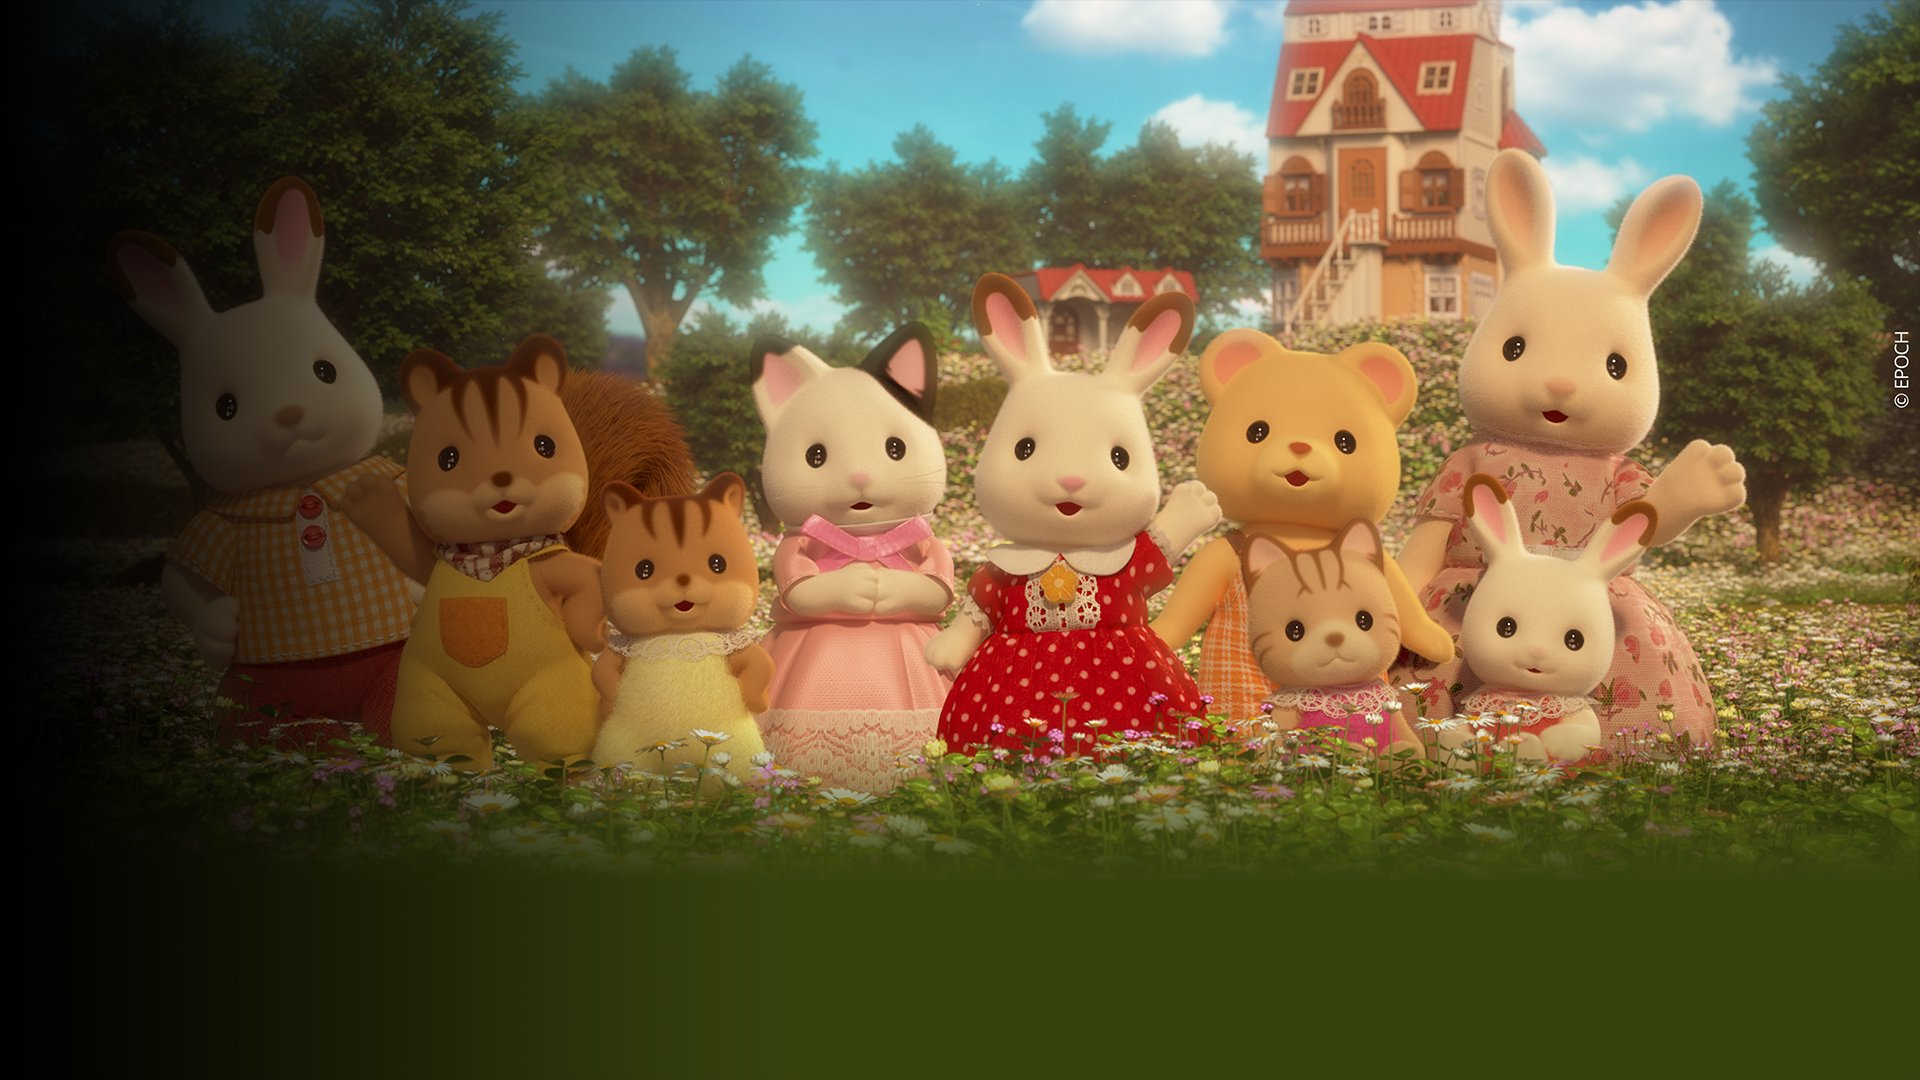 fond Sylvanian - S01 E01 - Bonjour la famille lapin chocolat !